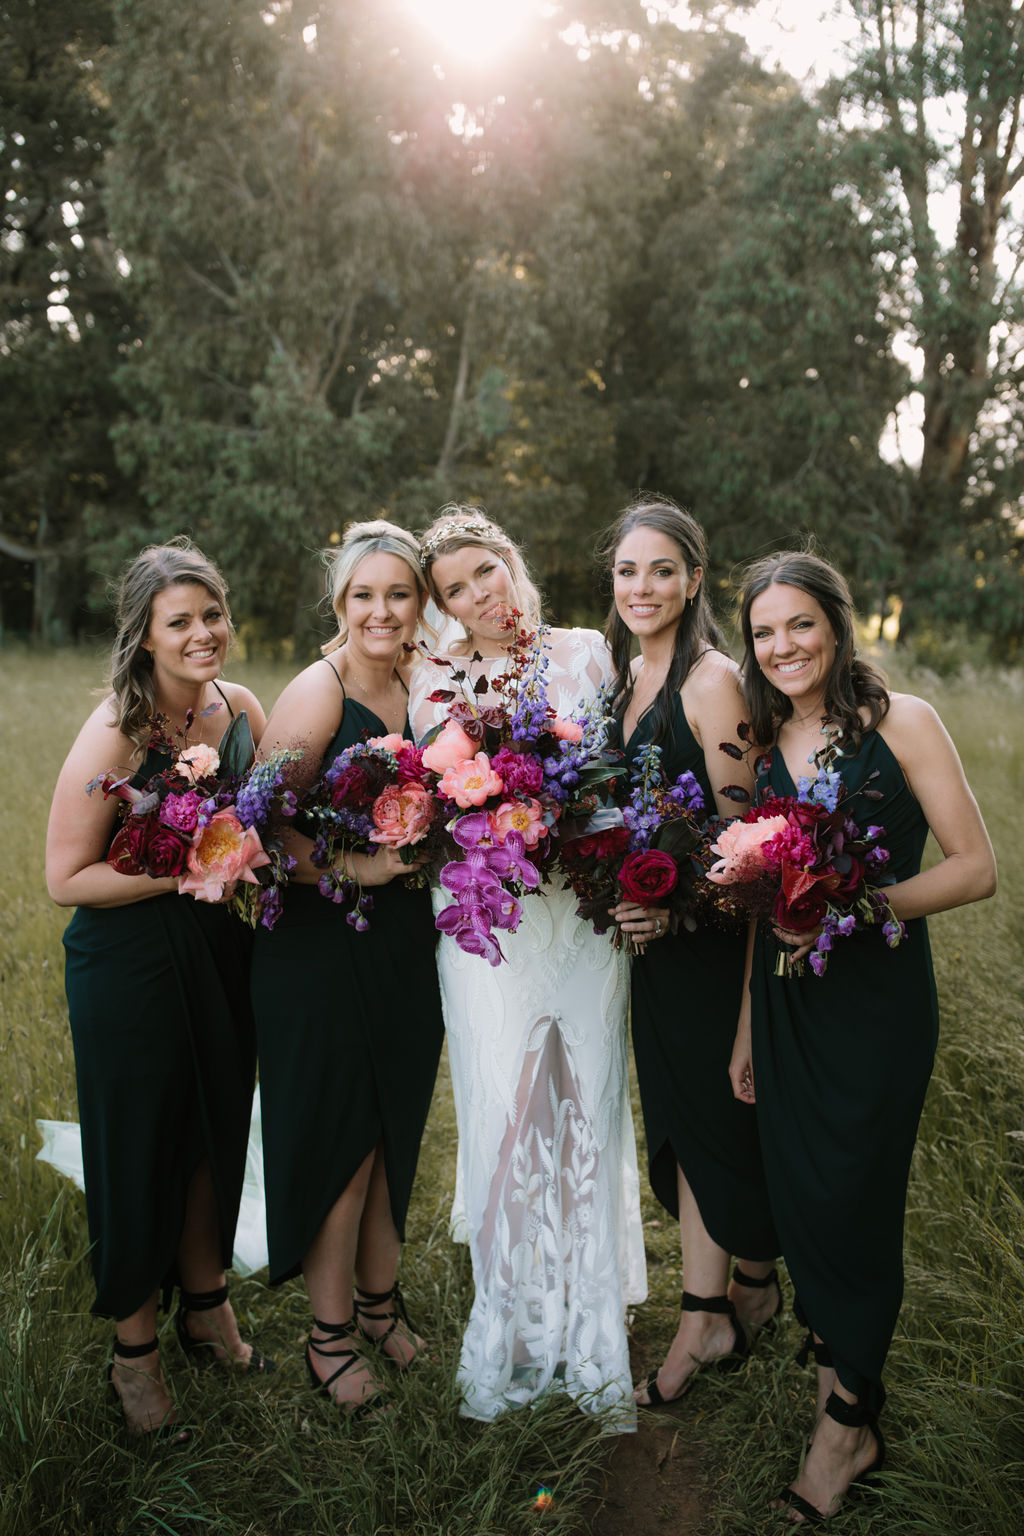 I-Got-You-Babe-Weddings-Erin-Dave710.JPG